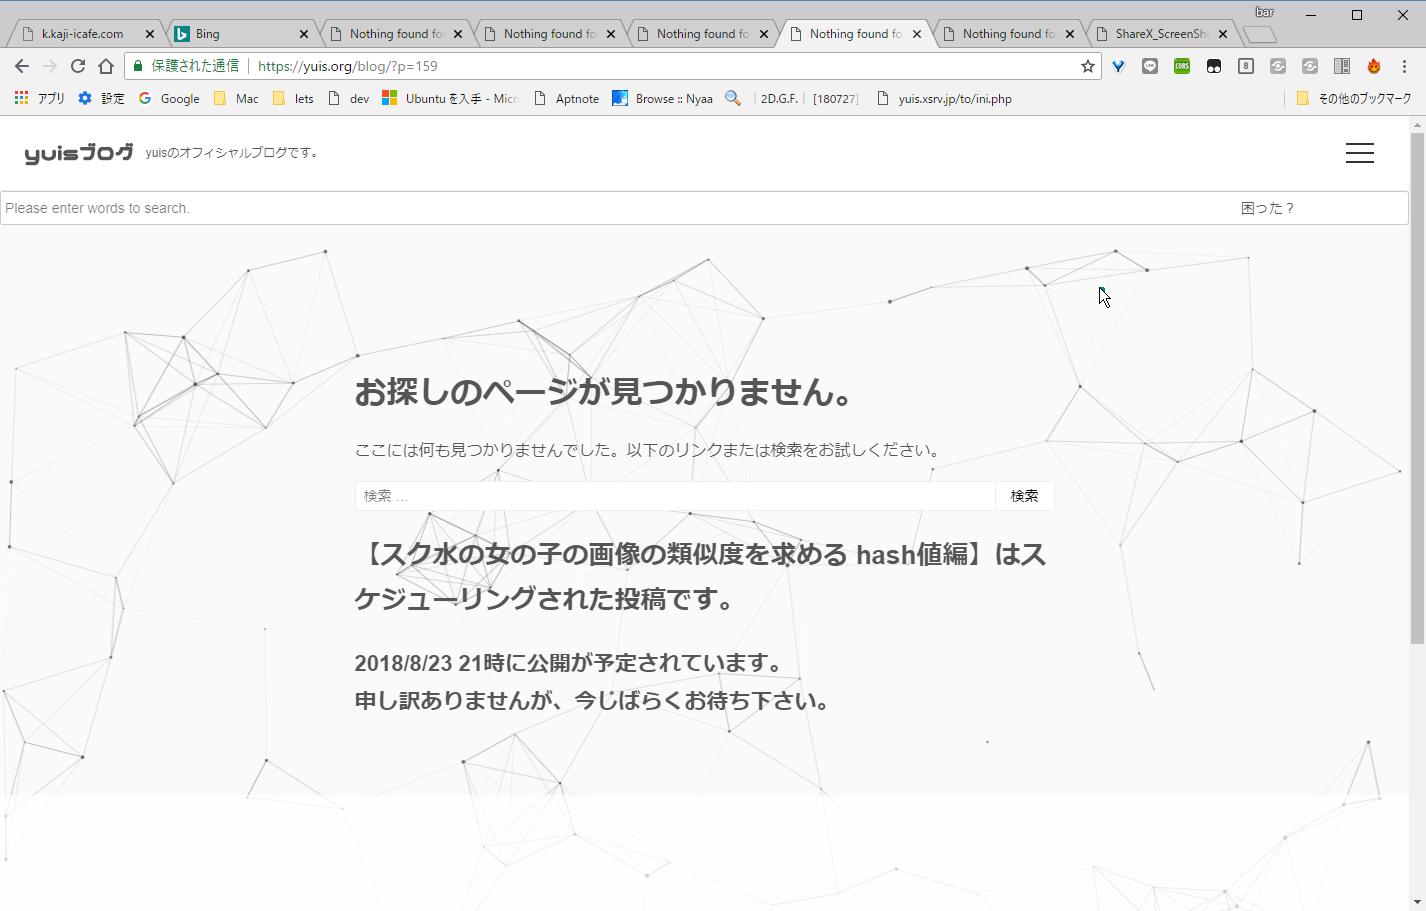 https://yuis.xsrv.jp/images/ss/ShareX_ScreenShot_aa98efda-b186-4ff1-9256-e13ddf3297f4.png